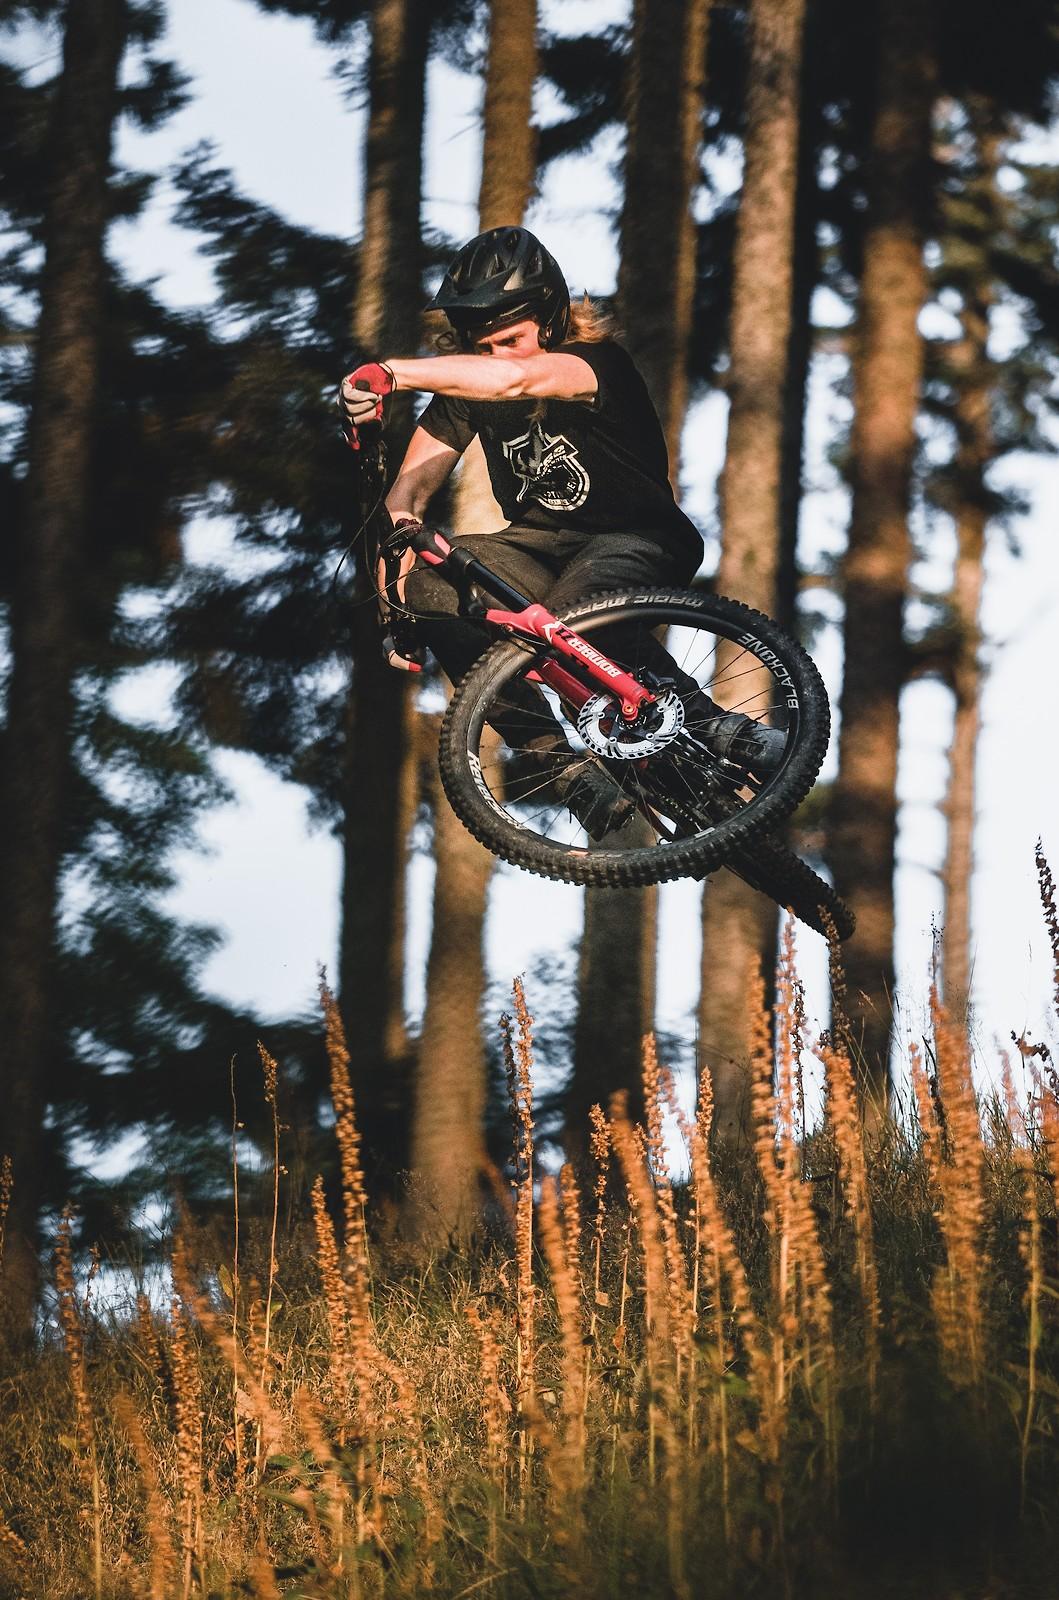 Scrubbing - Lucas_Bruder - Mountain Biking Pictures - Vital MTB